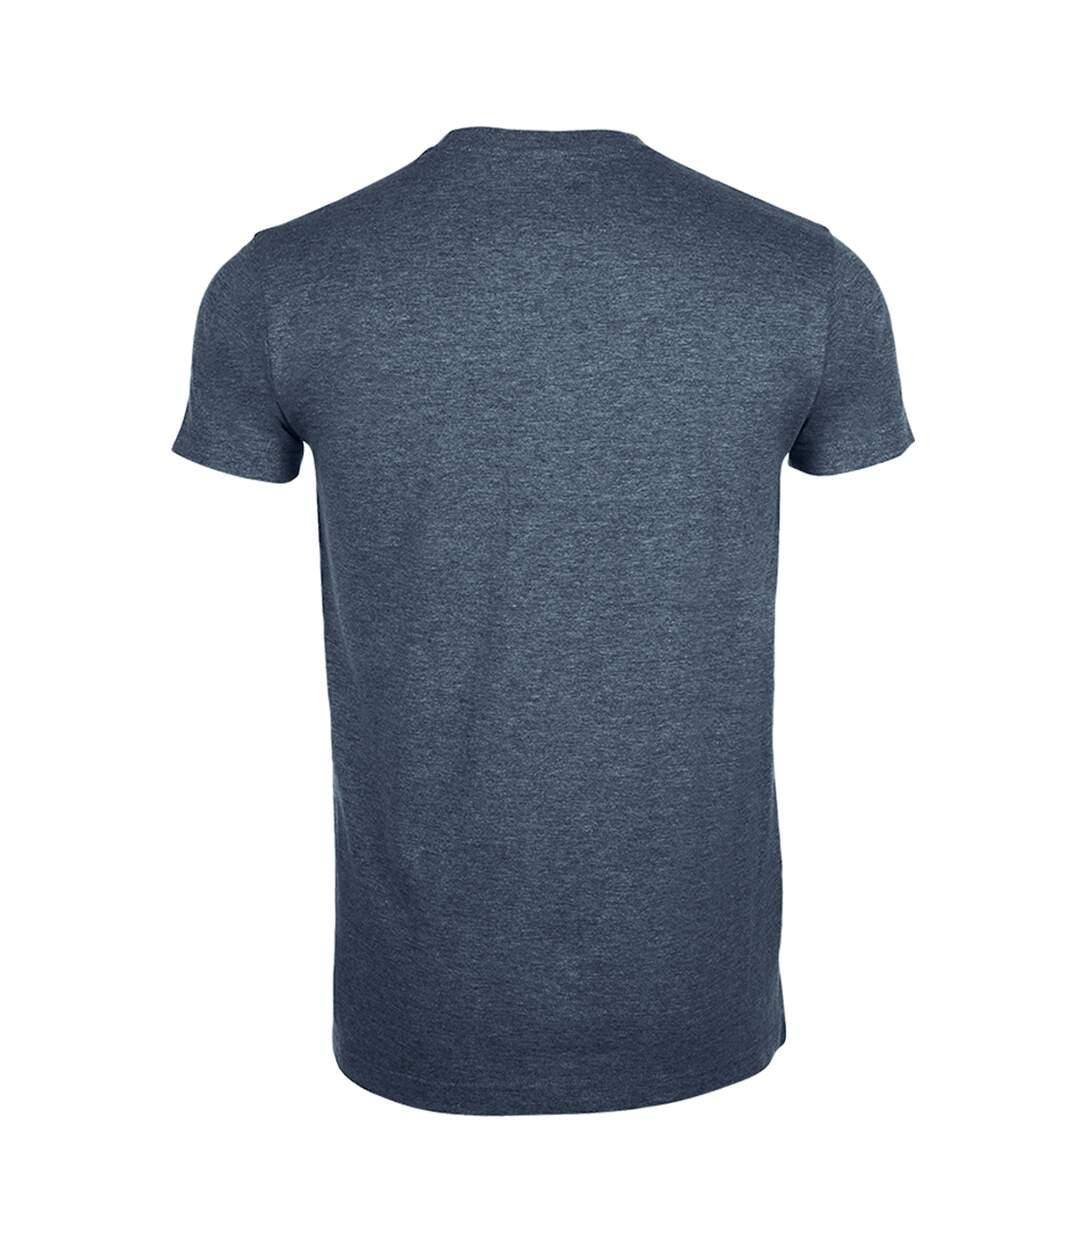 SOLS Mens Imperial Slim Fit Short Sleeve T-Shirt (White) - UTPC507